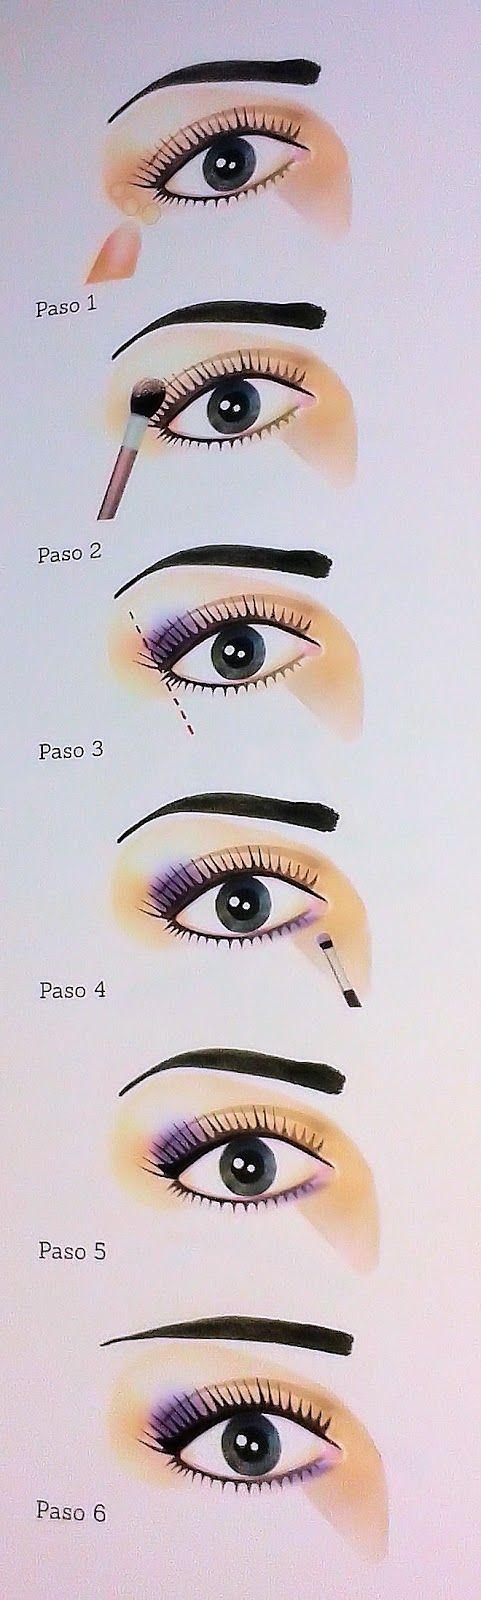 Cómo maquillar unos ojos caídos o tristes paso a paso | Pinterest ...